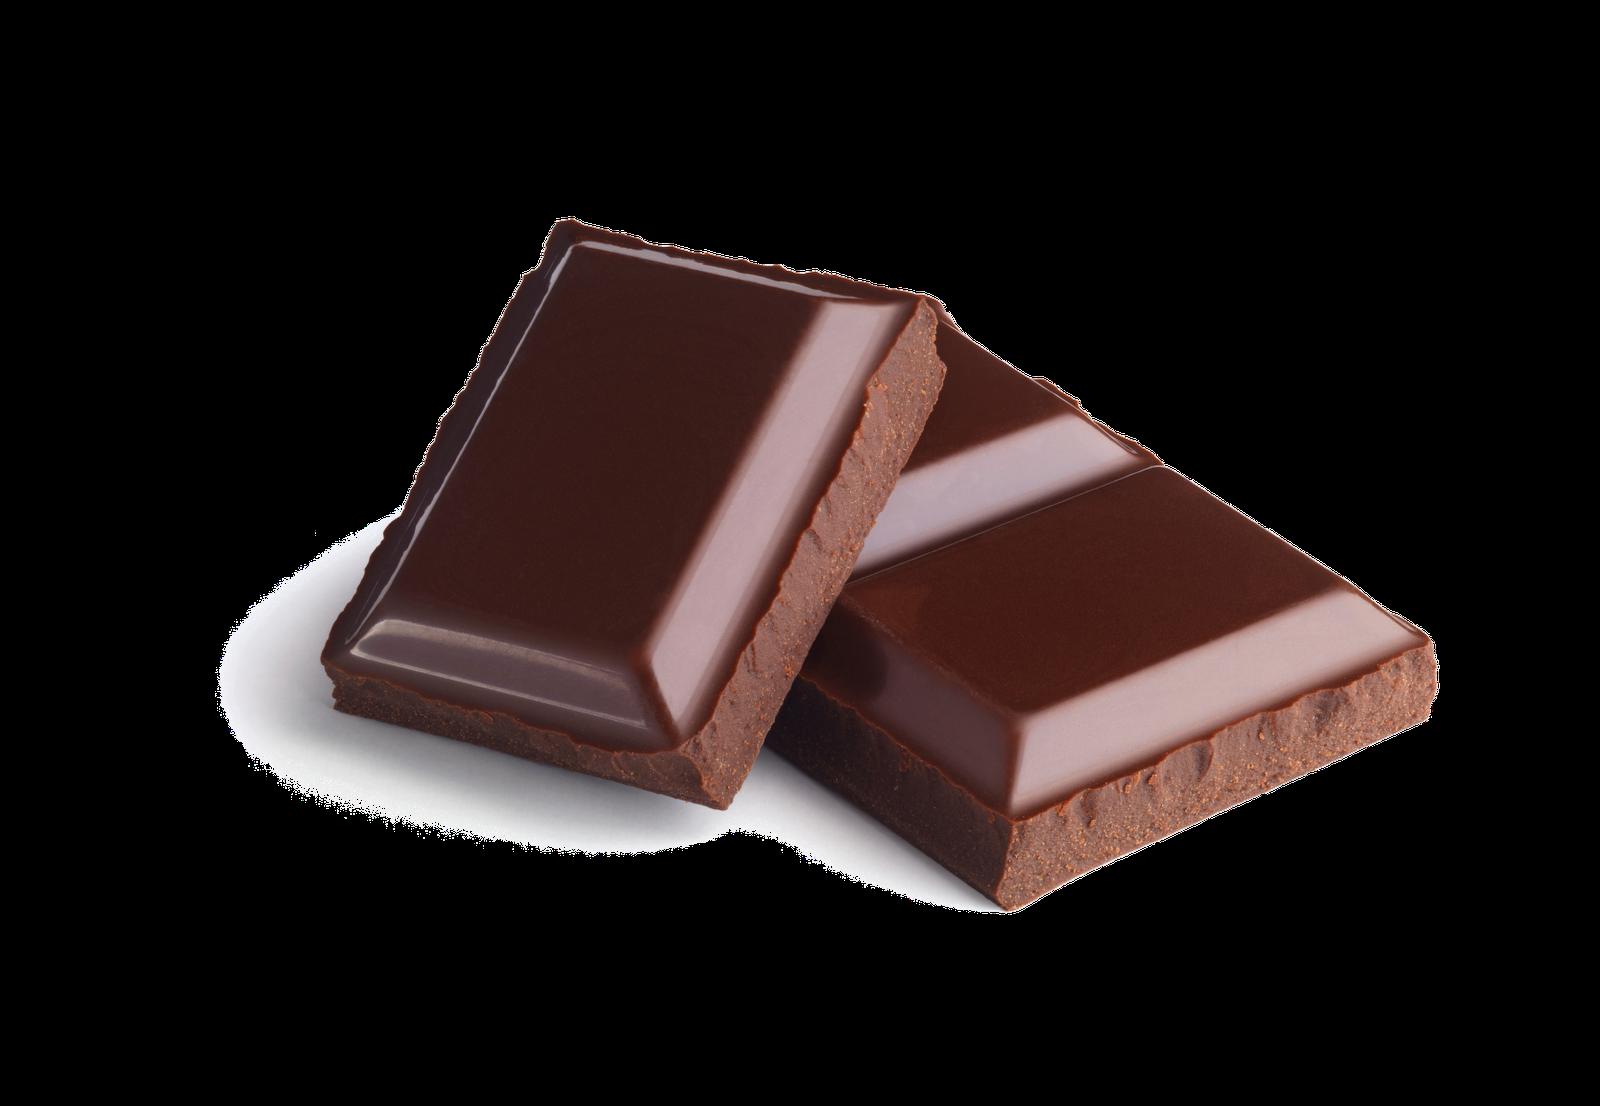 beneficios-del-chocolate-tan-inn-blog